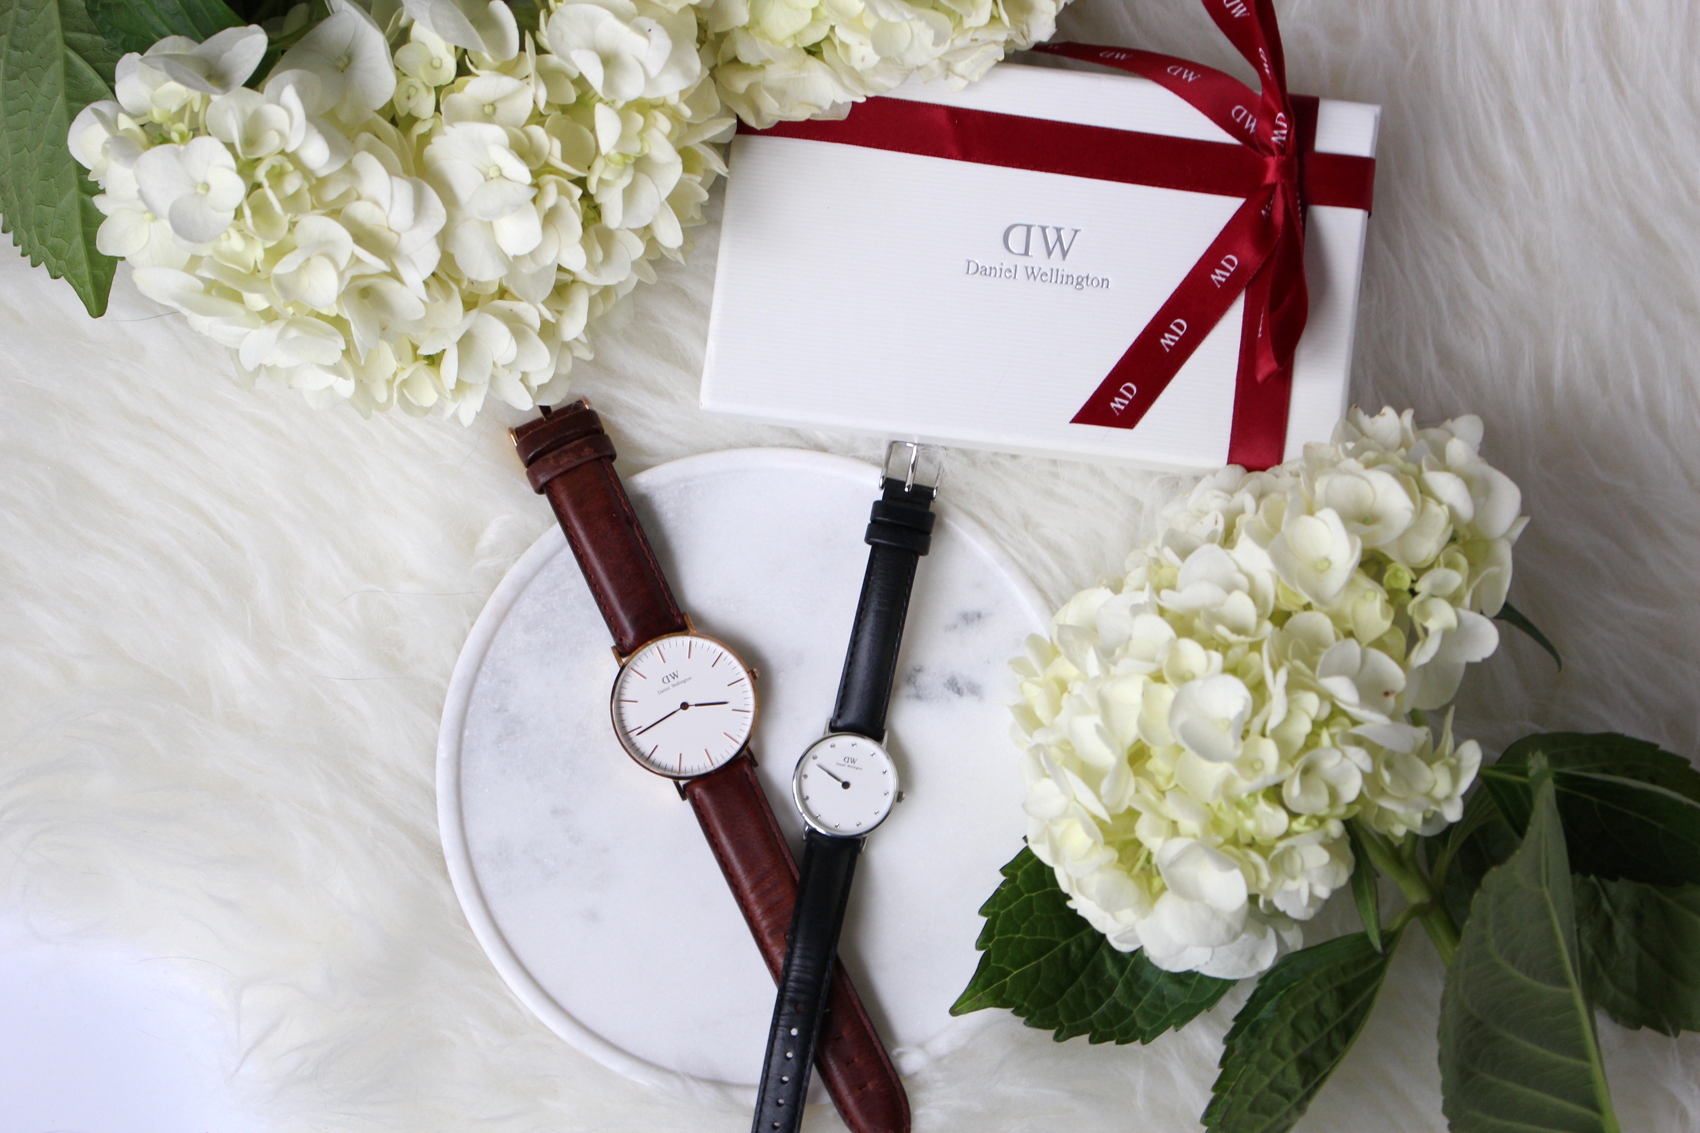 Daniel Wellington timepiece,  Classy Sheffield and Classic Bristol.